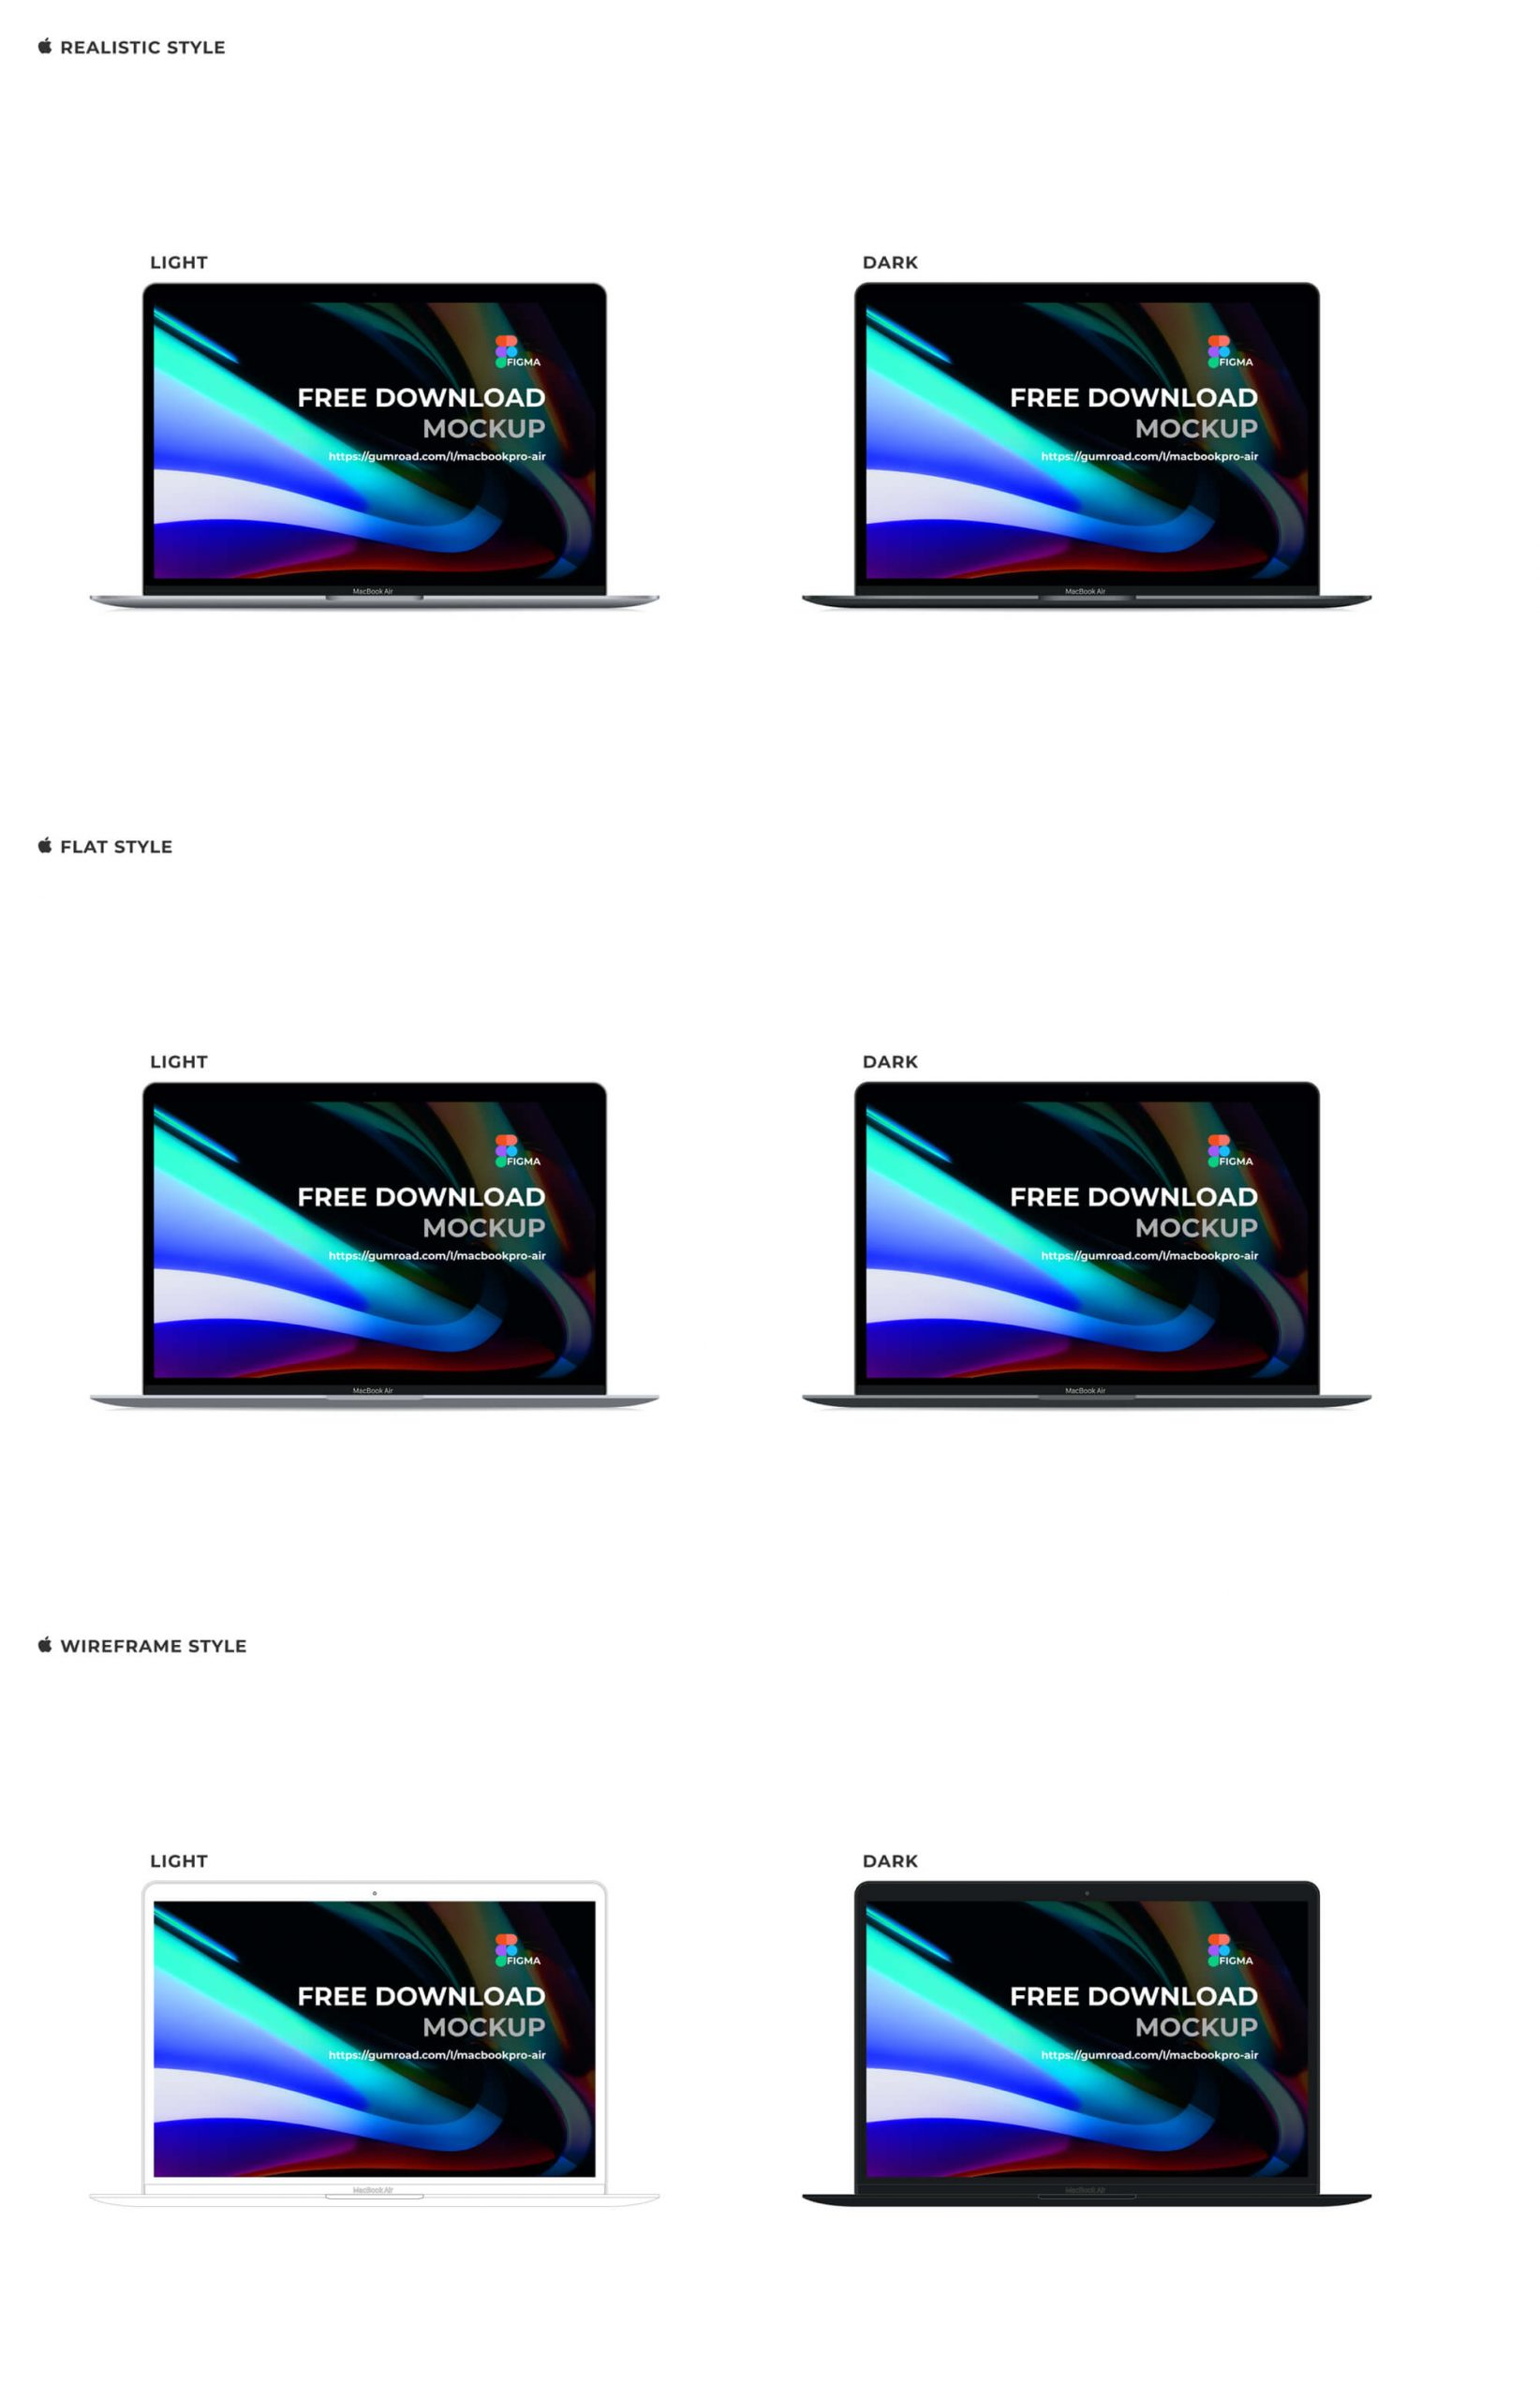 figma macbook pro air mockup 3 scaled - UI Freebies